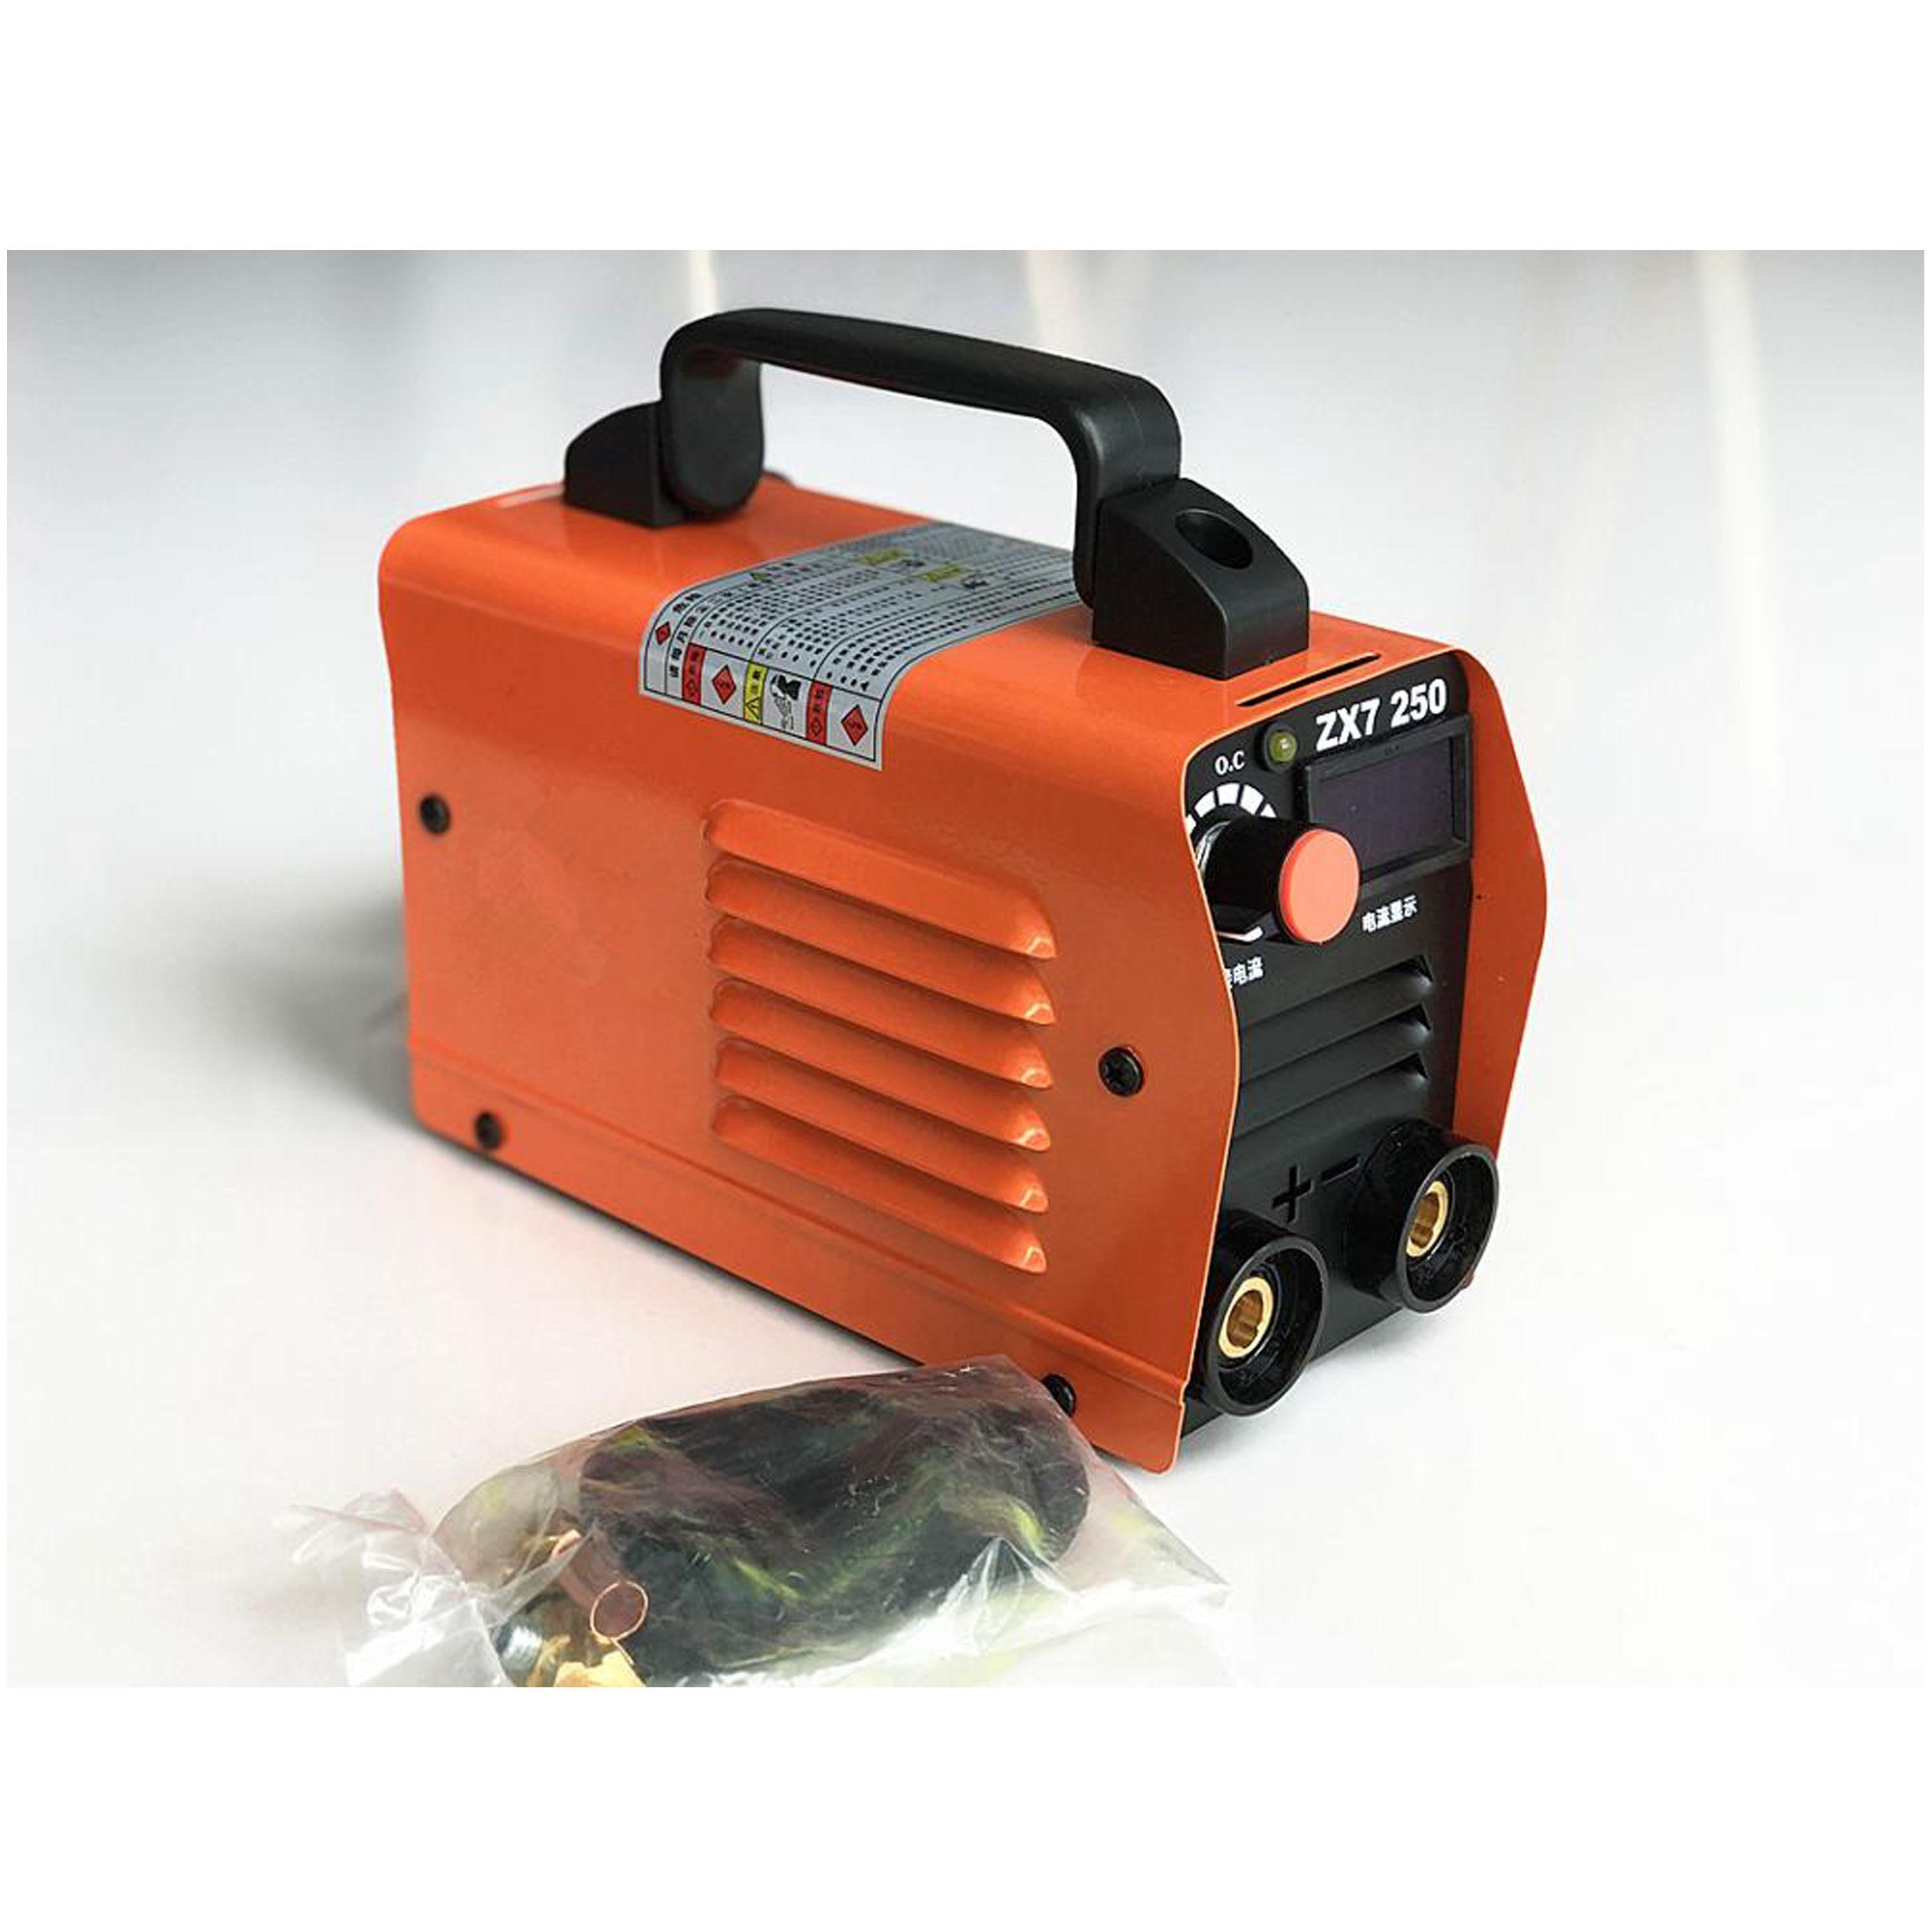 Delivery ARC Welder Welder Mini 220V Compact Free RU MMA Machine Inverter 250A For Stick Welding